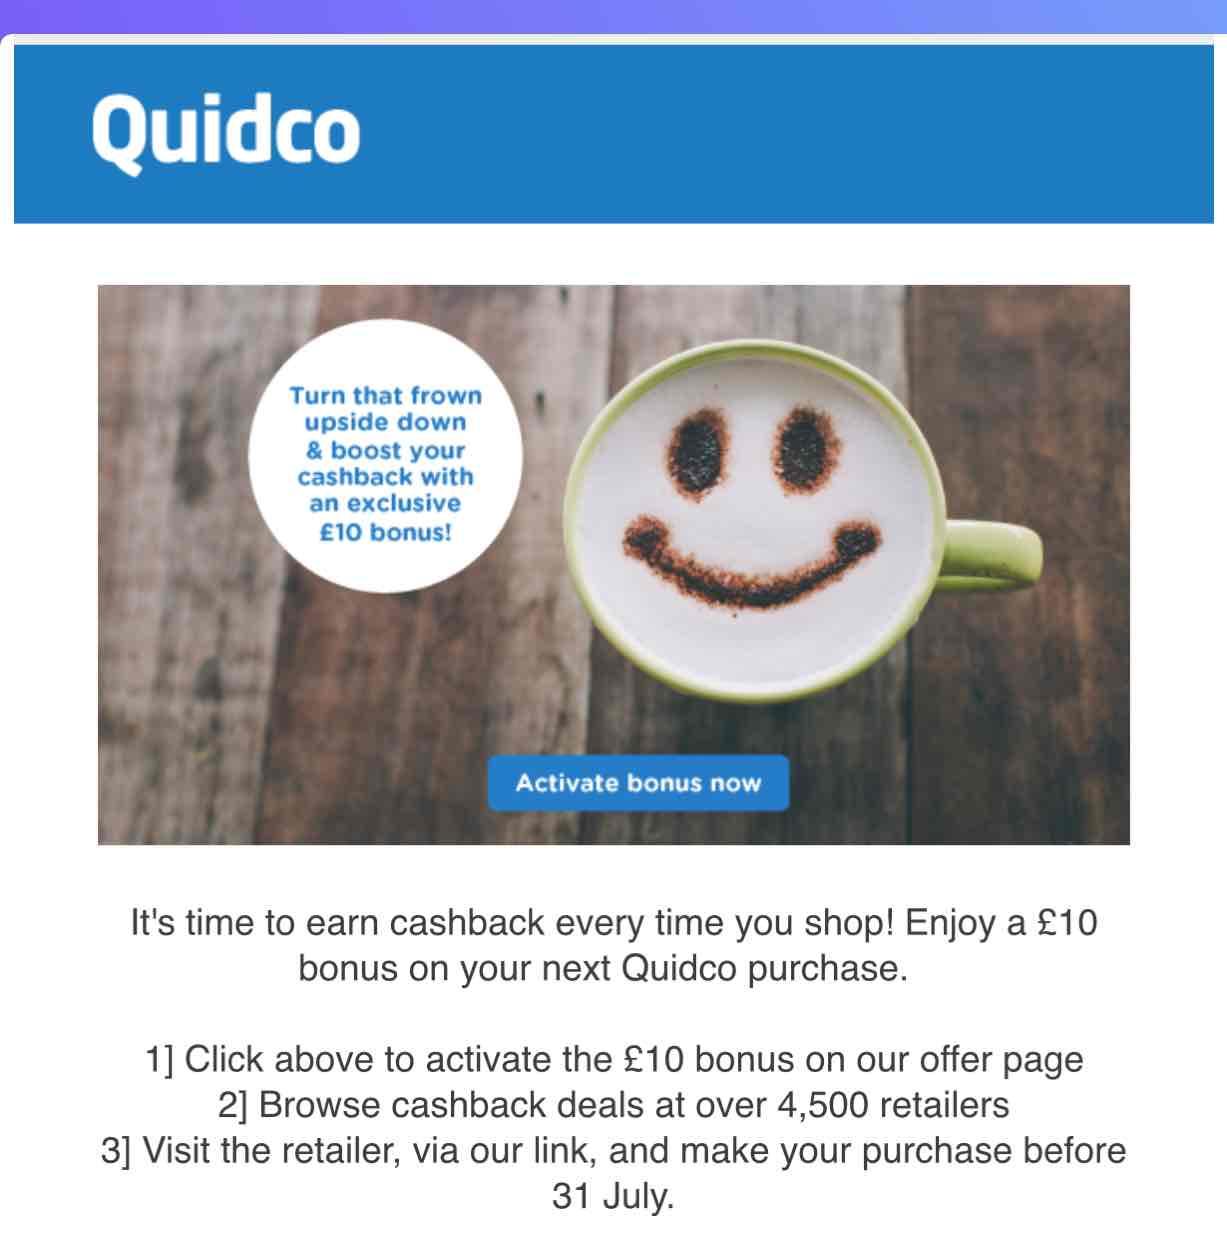 £10 bonus cash back @ Quidco - possibly account specific